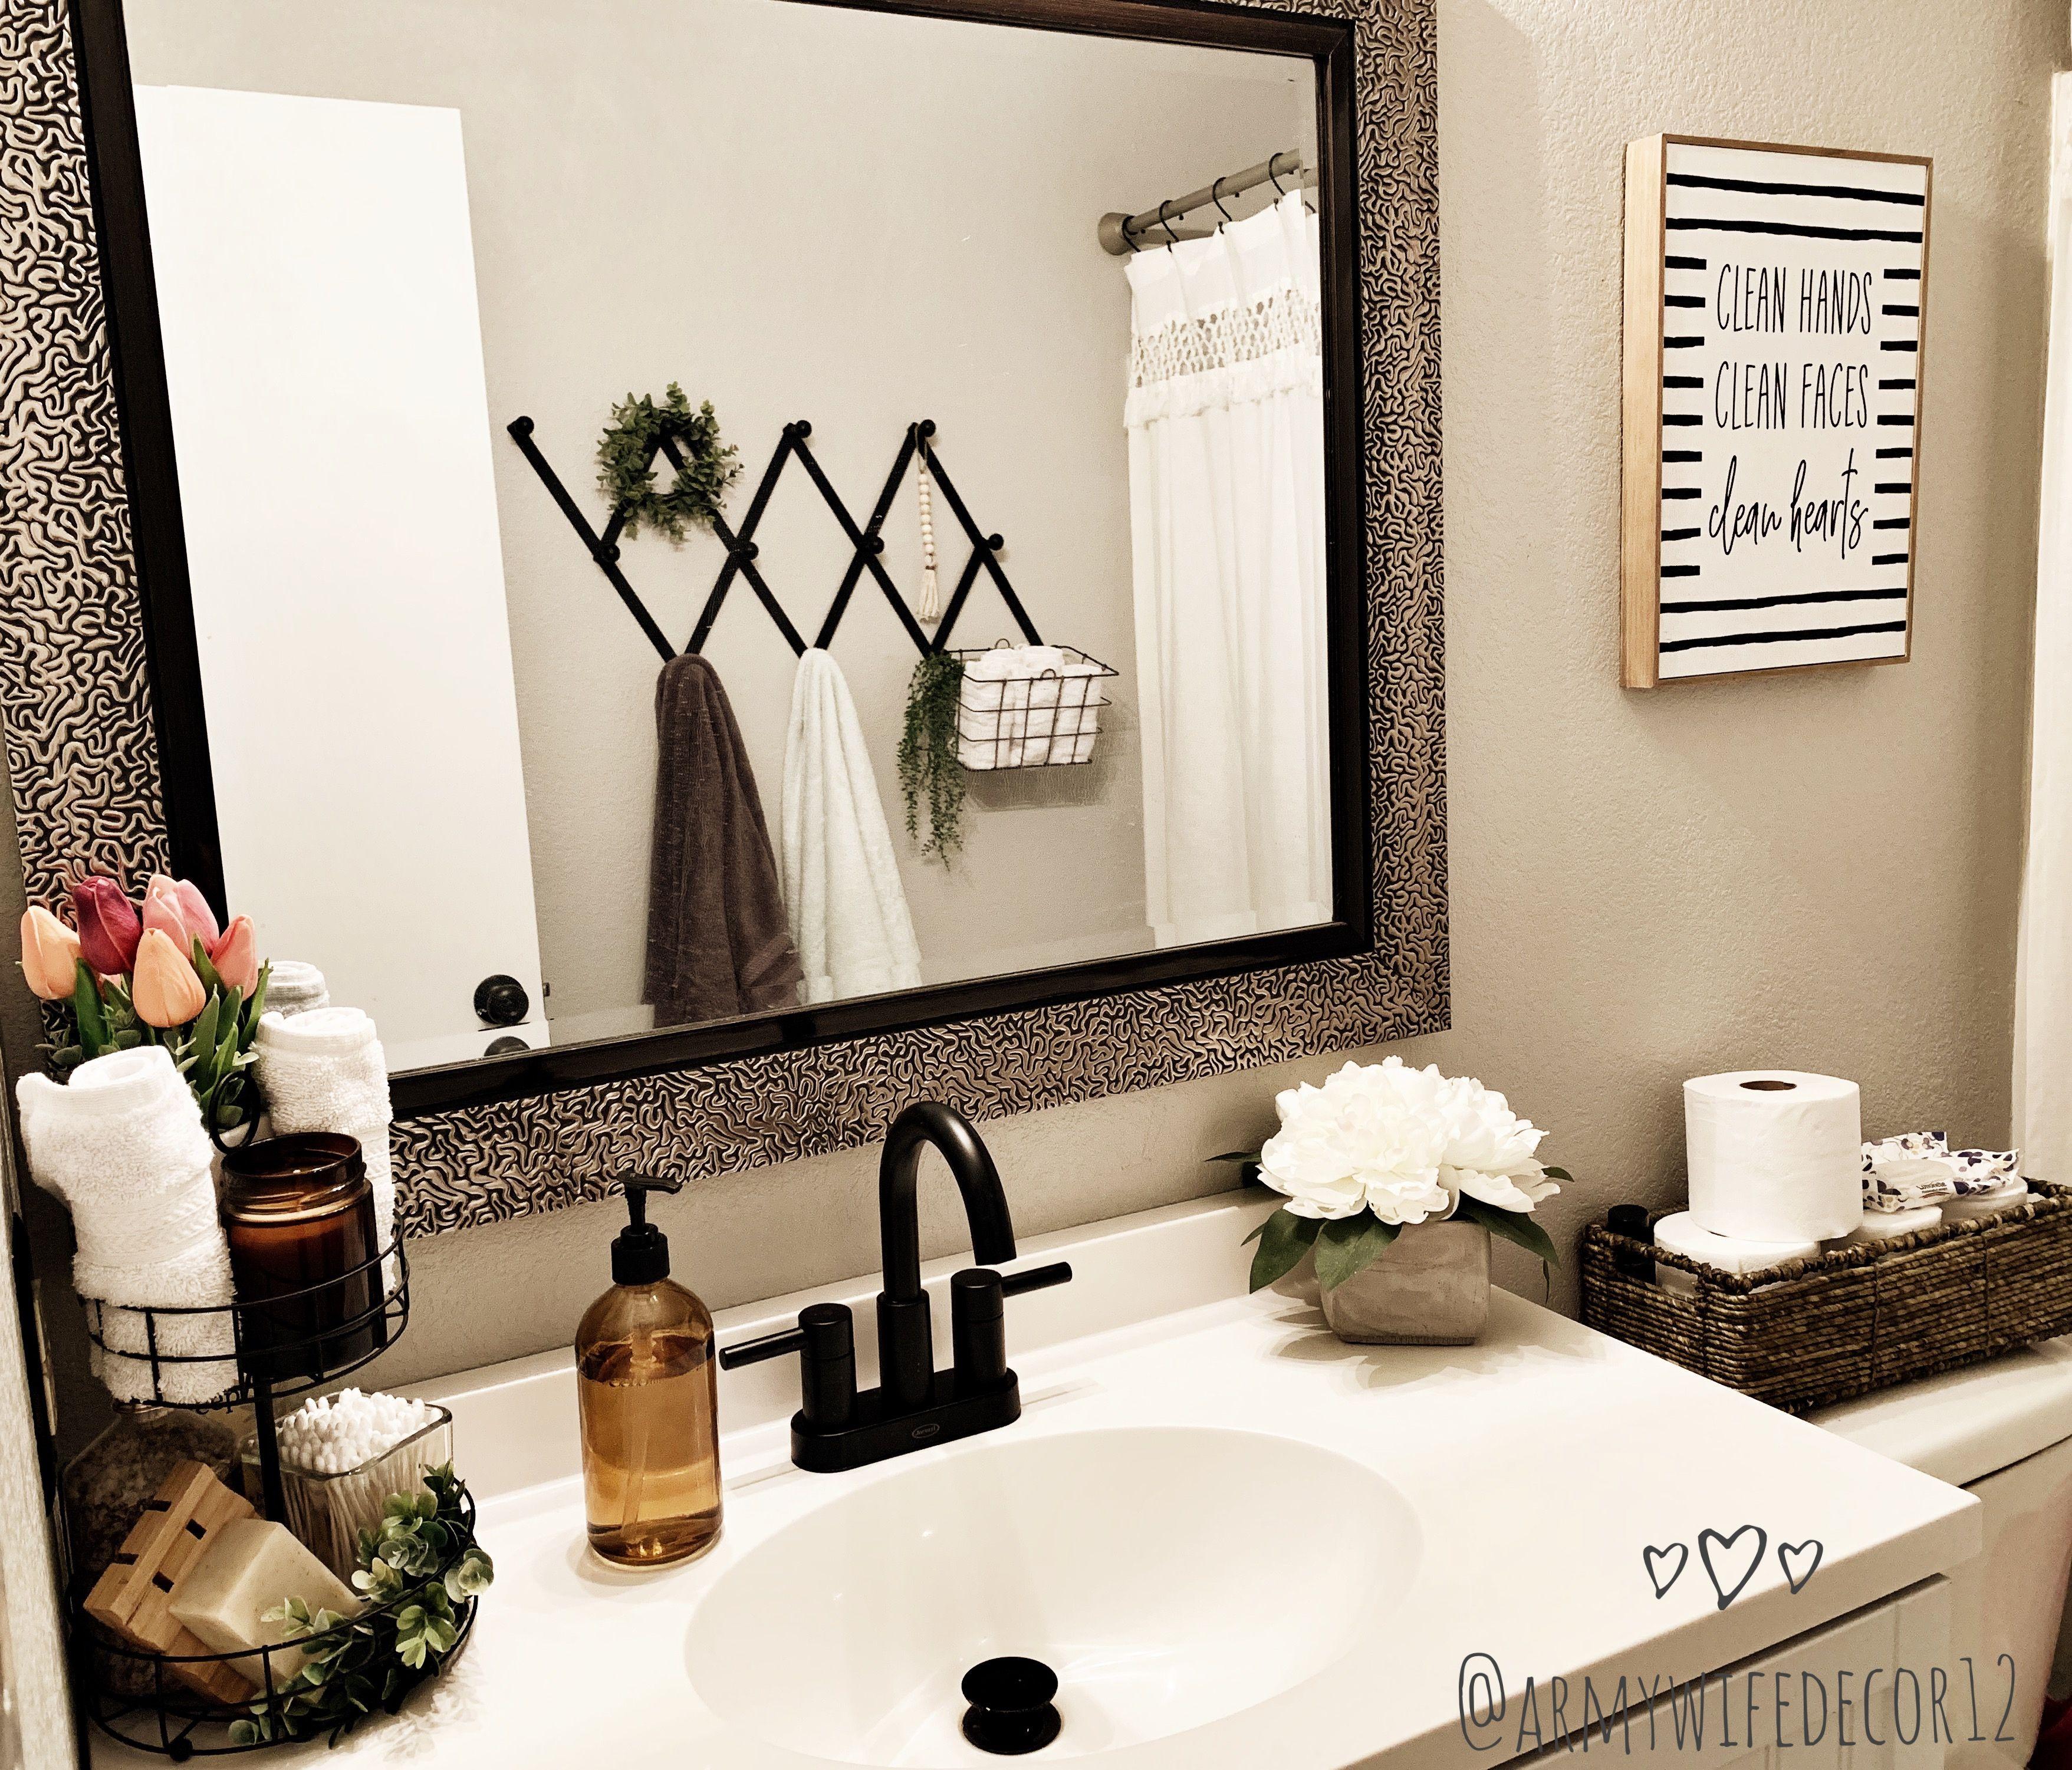 Towel Rack Idea For Guest Bathroom Towel Rack Bathroom Towel Rack Bathroom Towels Bathroom hand towel ideas